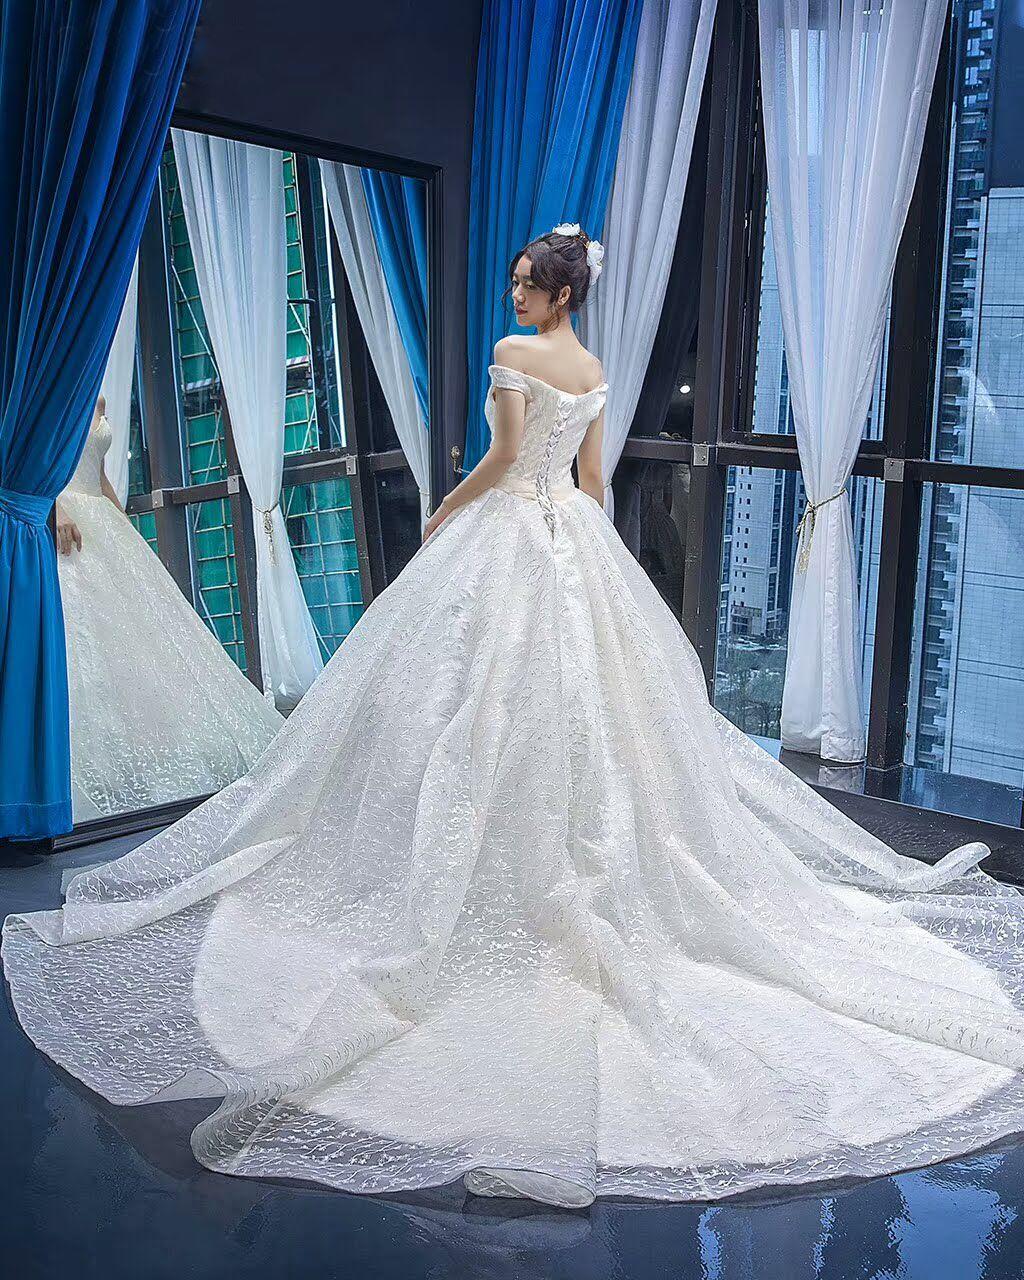 XP BRIDAL WEDDING DRESS WHOLESALLER -- Instagram @xpbridal_id